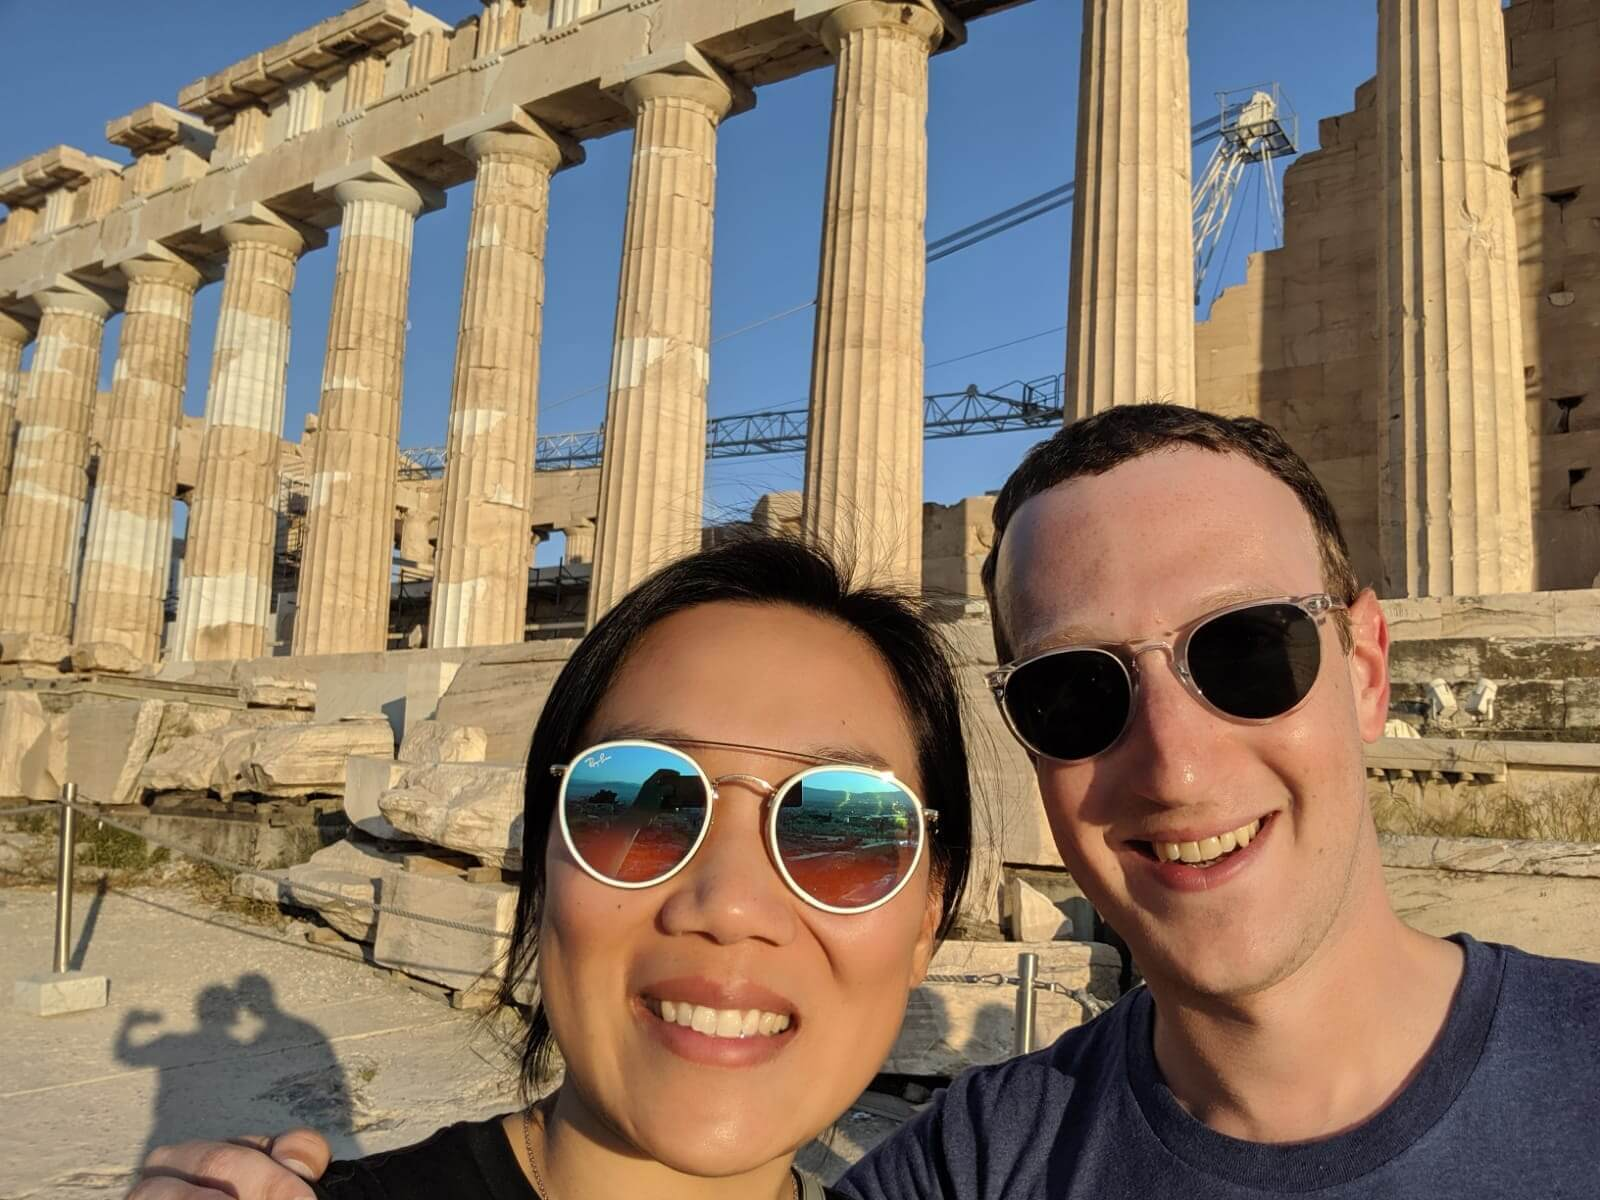 Mark Zuckerberg: Έκανε check in στην Ακρόπολη!